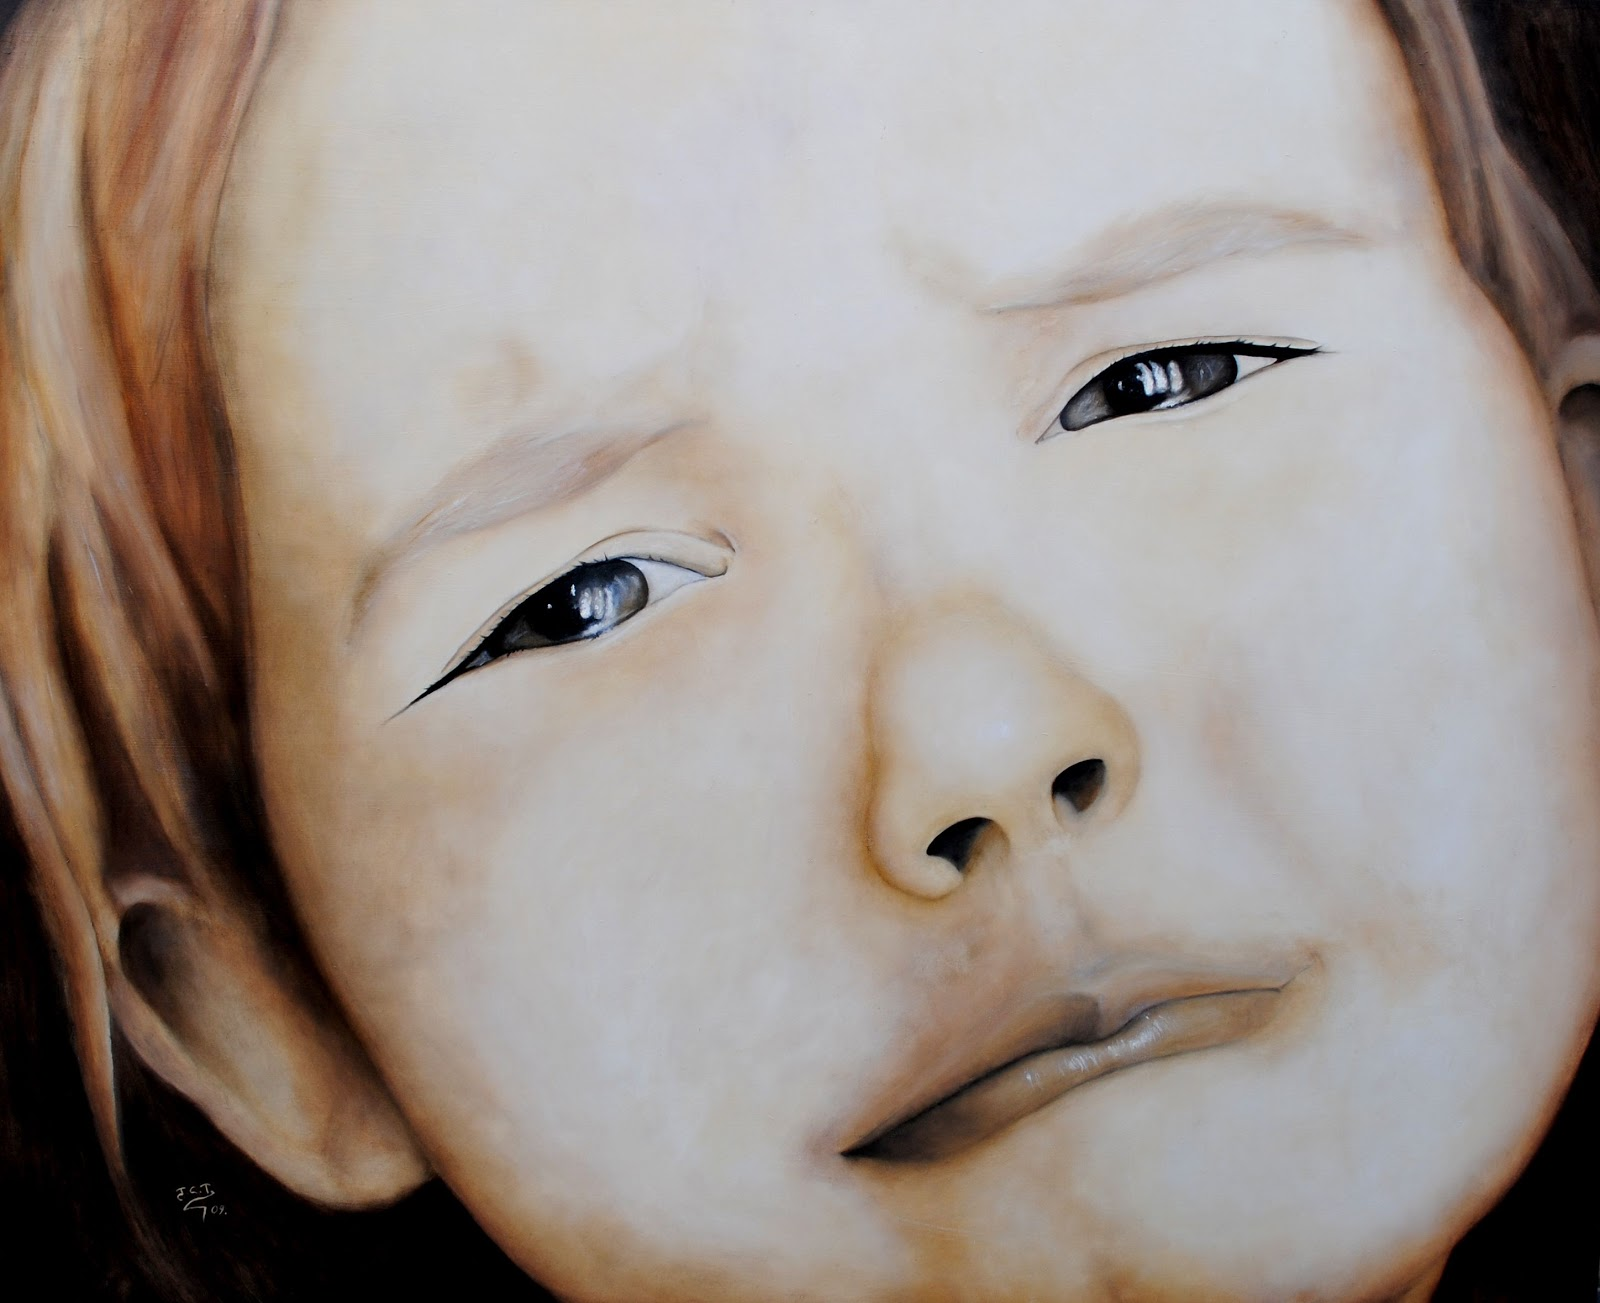 Adorables caritas de niños. - Página 2 NI+%C3%A6A+TRISTE+-+125x100cm+-+400%C3%94%C3%A9%C2%BC